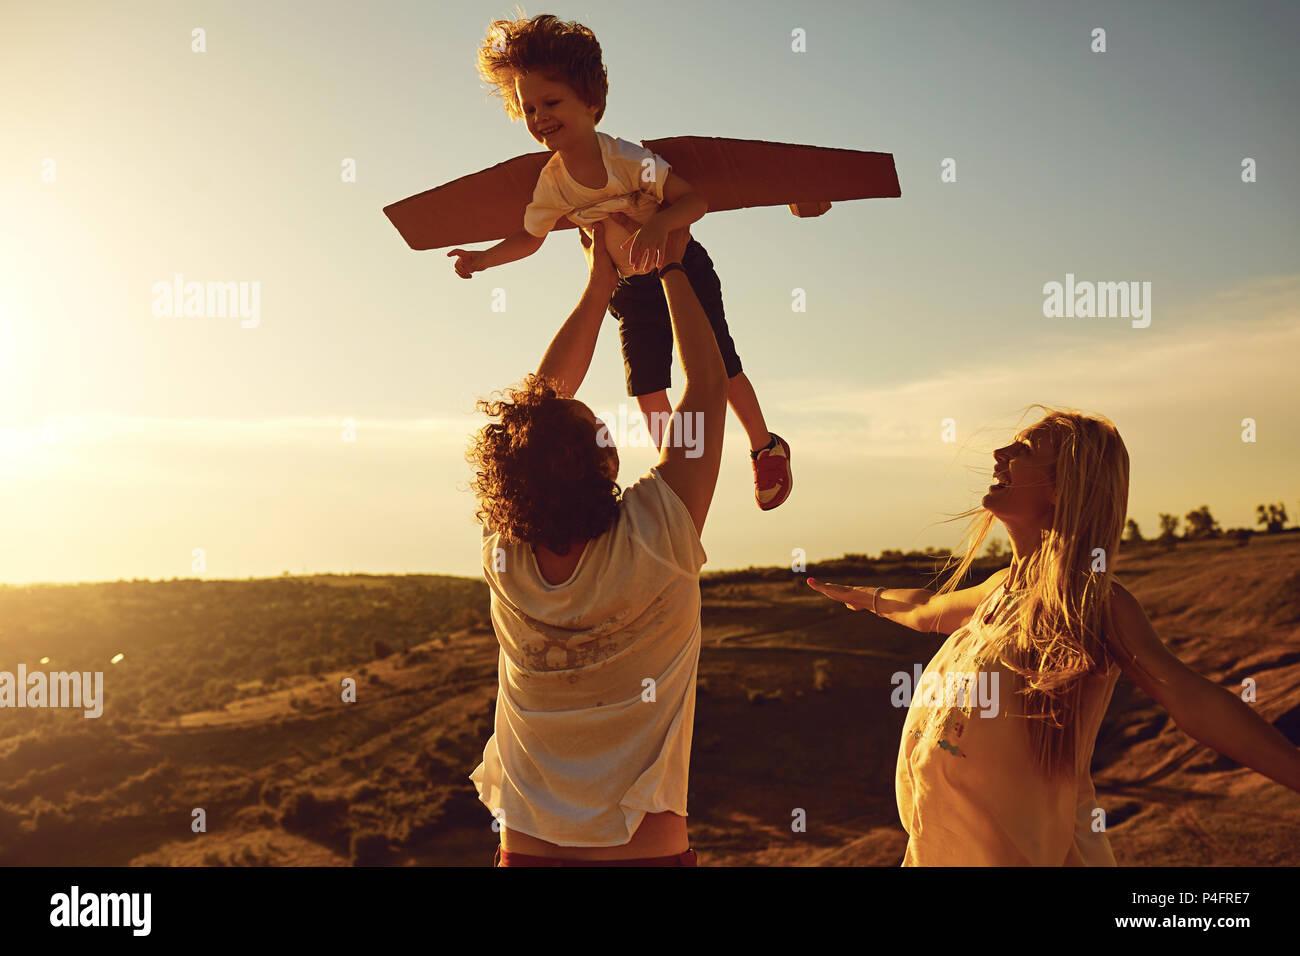 Familie spielen in der Natur bei Sonnenuntergang Stockbild